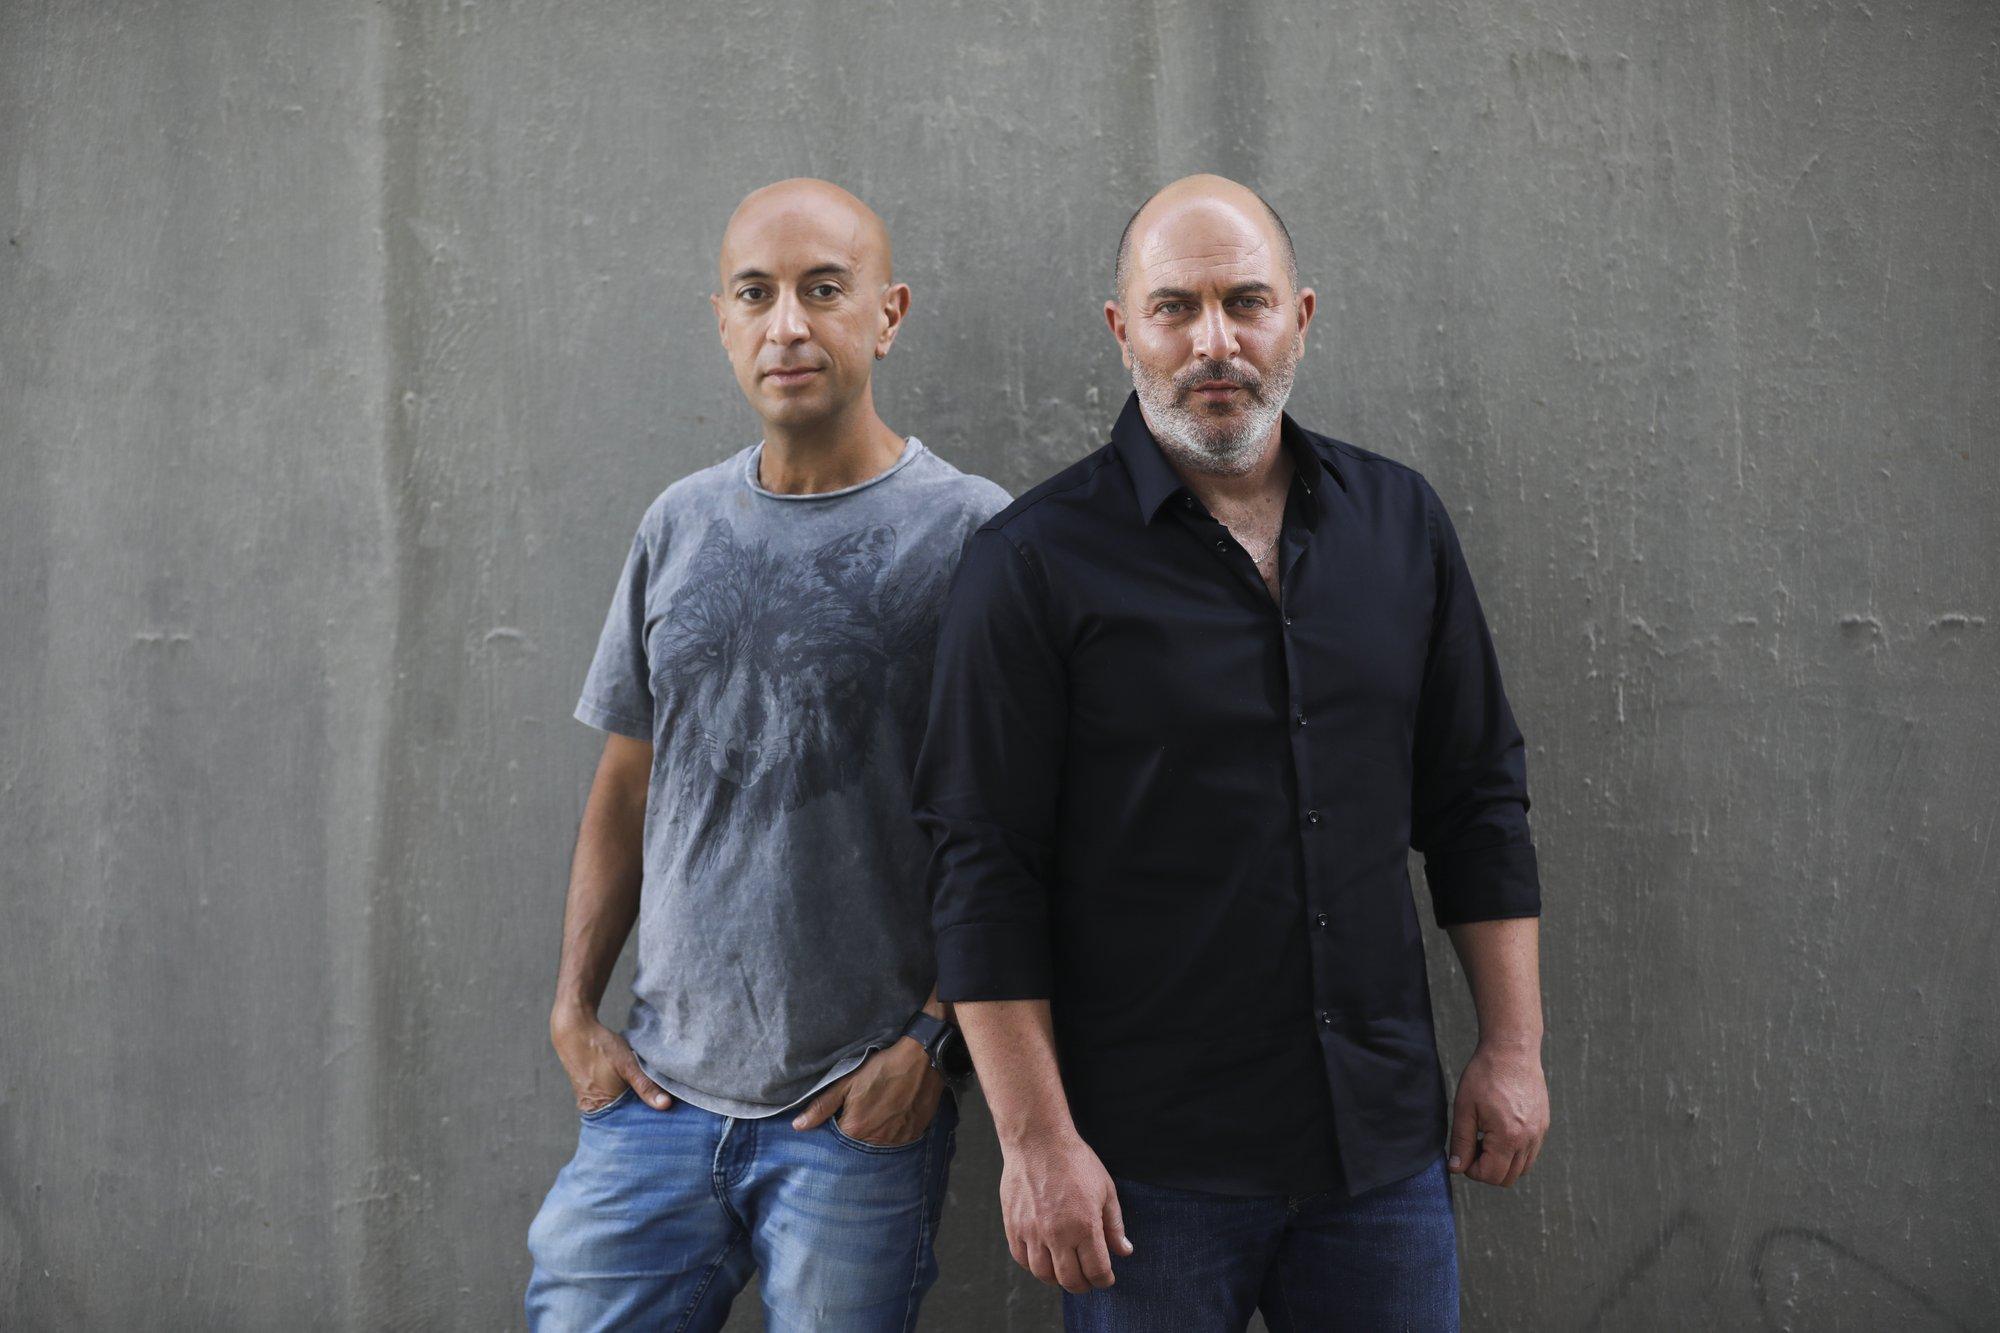 Co-creators of Israel's hit TV show Fauda, Avi Issacharoff, left, and Lior Raz